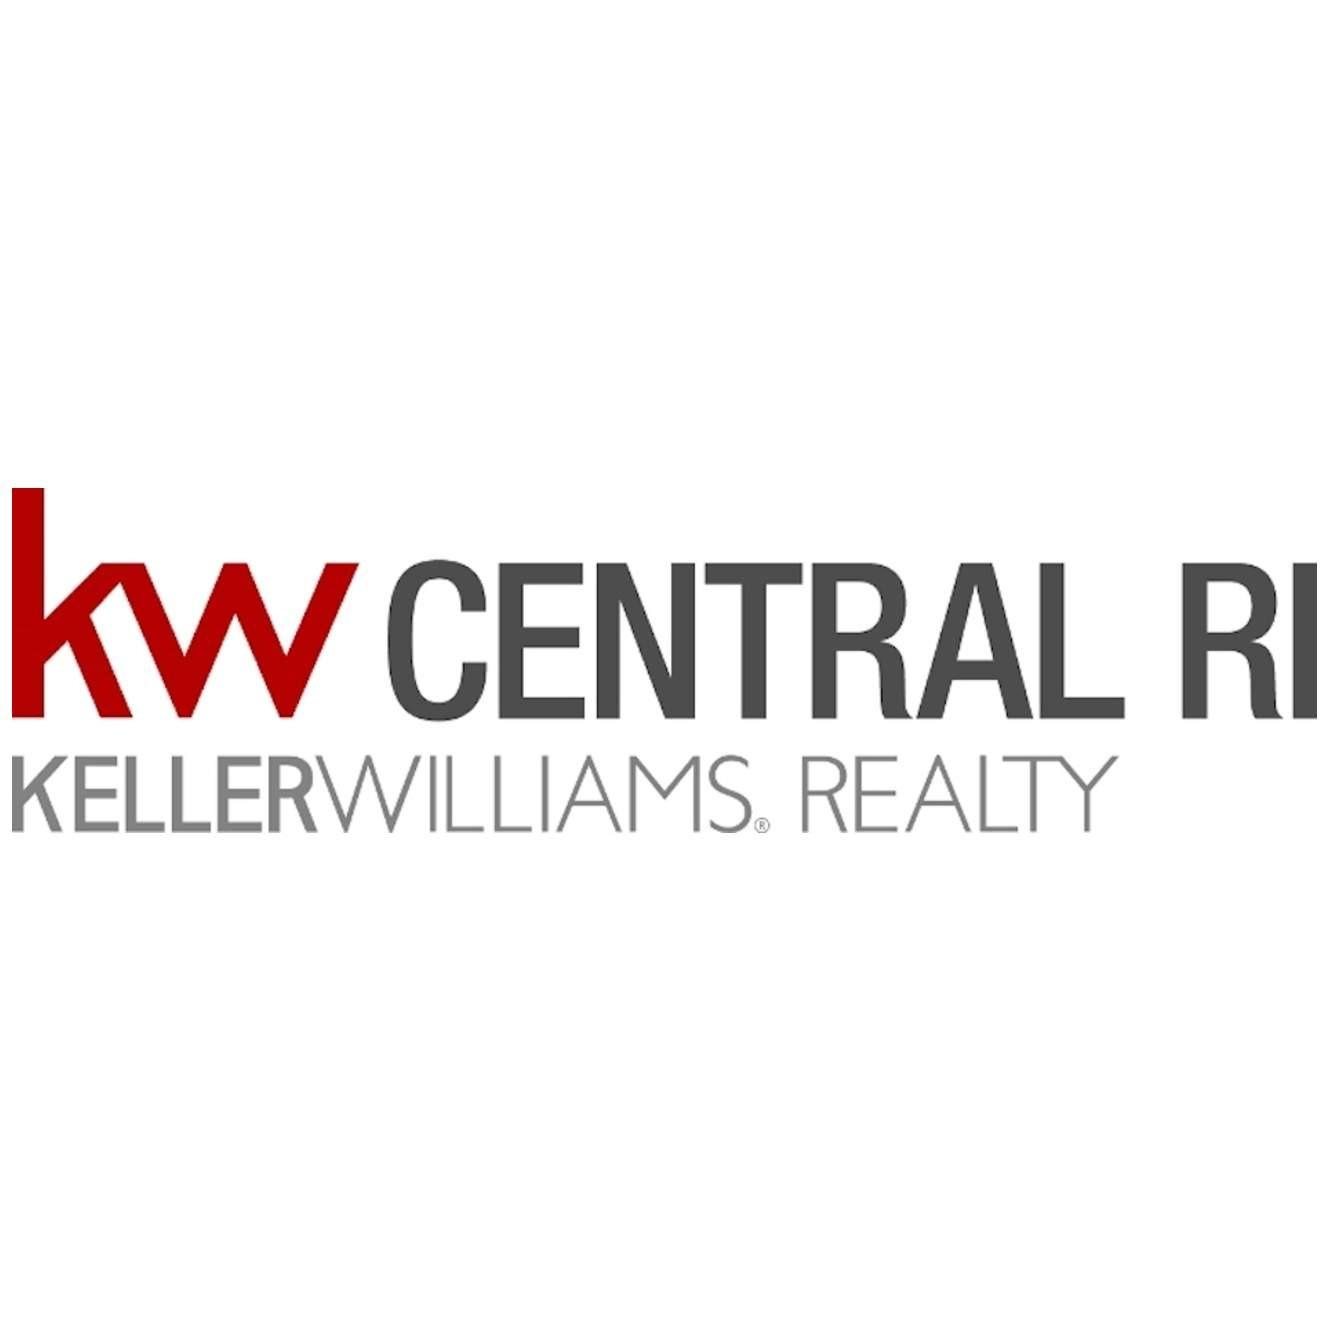 Keller Williams Central Rhode Island